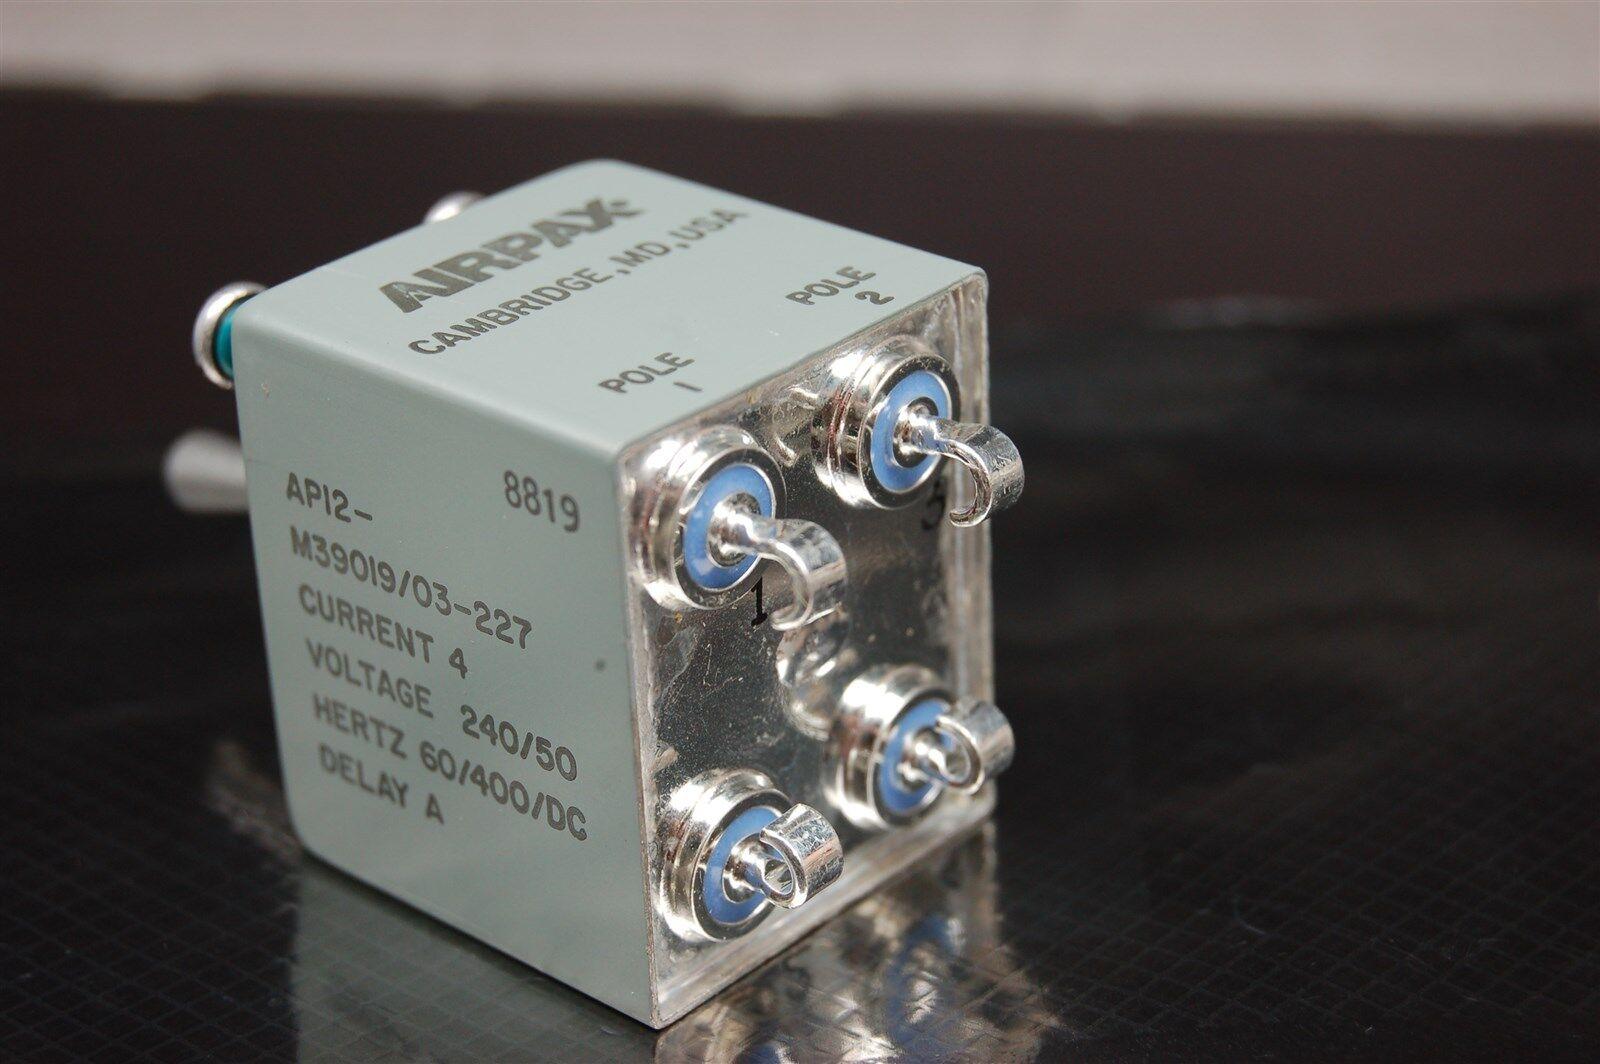 Airpax 2 Pole 240vac 50vdc 4a 09 Sec Time Delay Circuit Breaker Timedelaycircuit M39019 03 227 Ebay